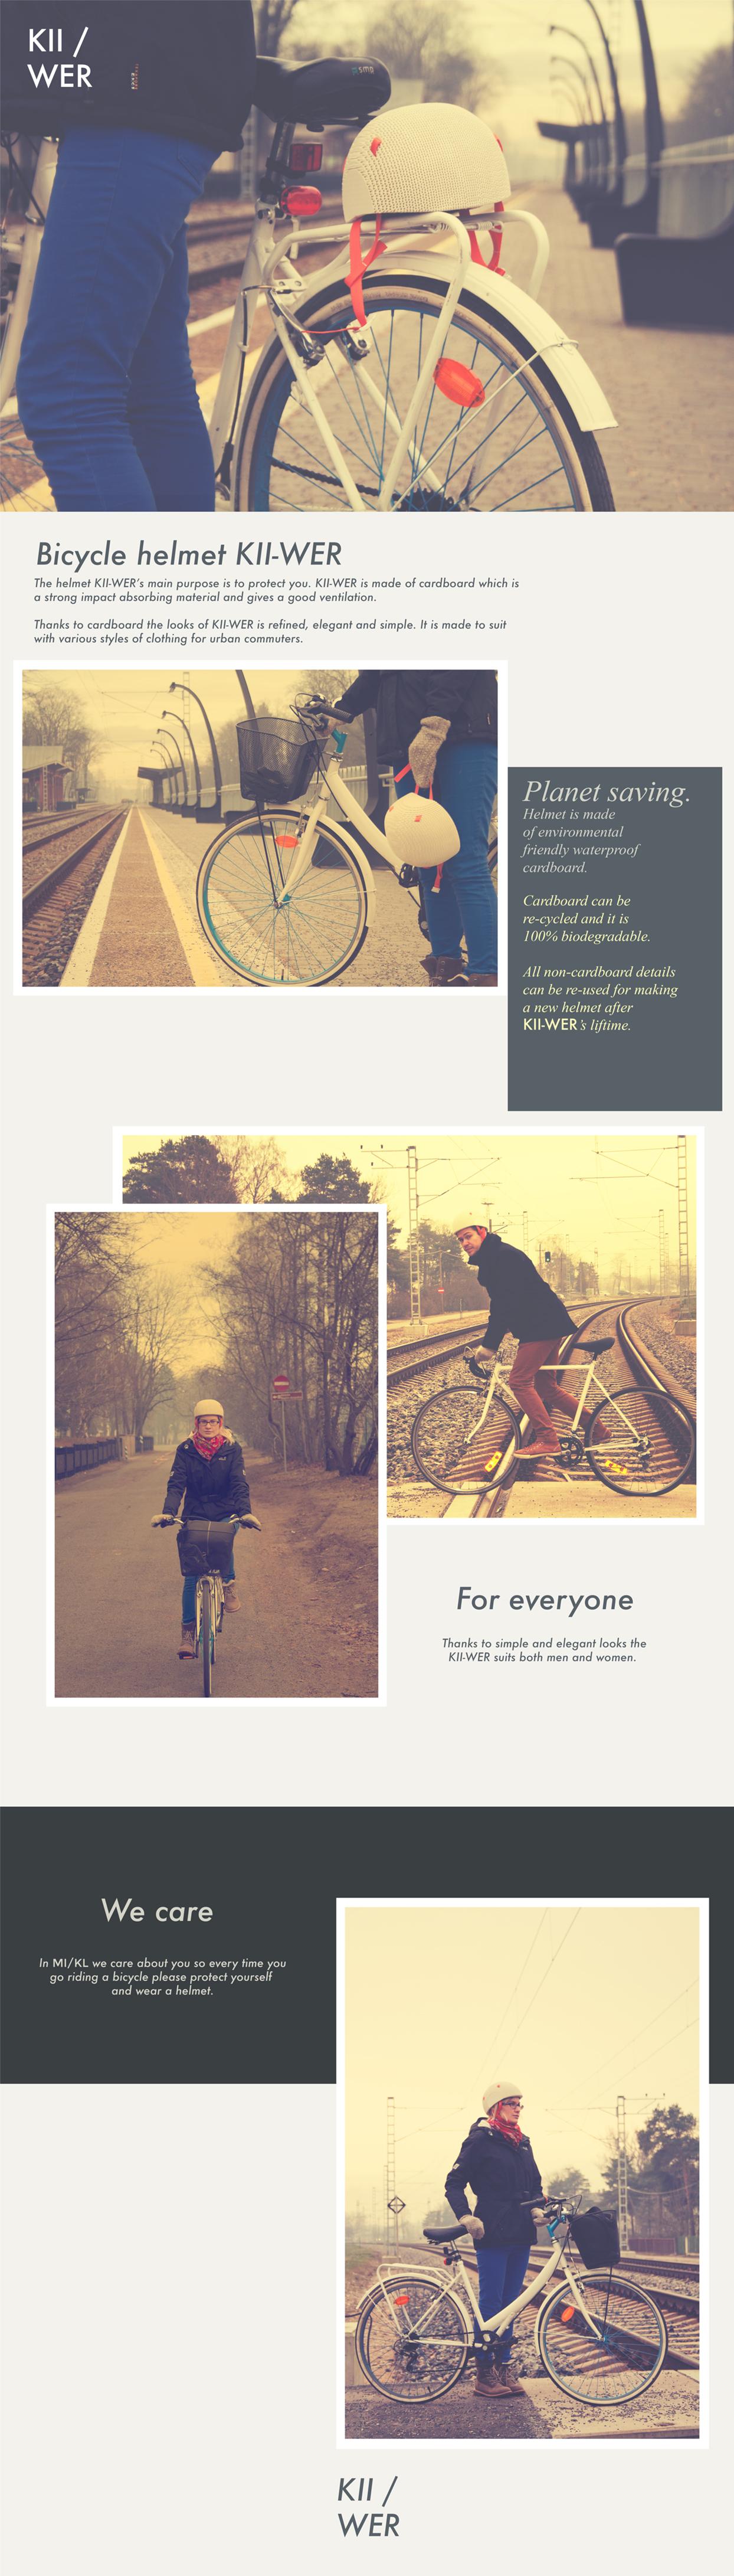 bike_helmet_kiiwer